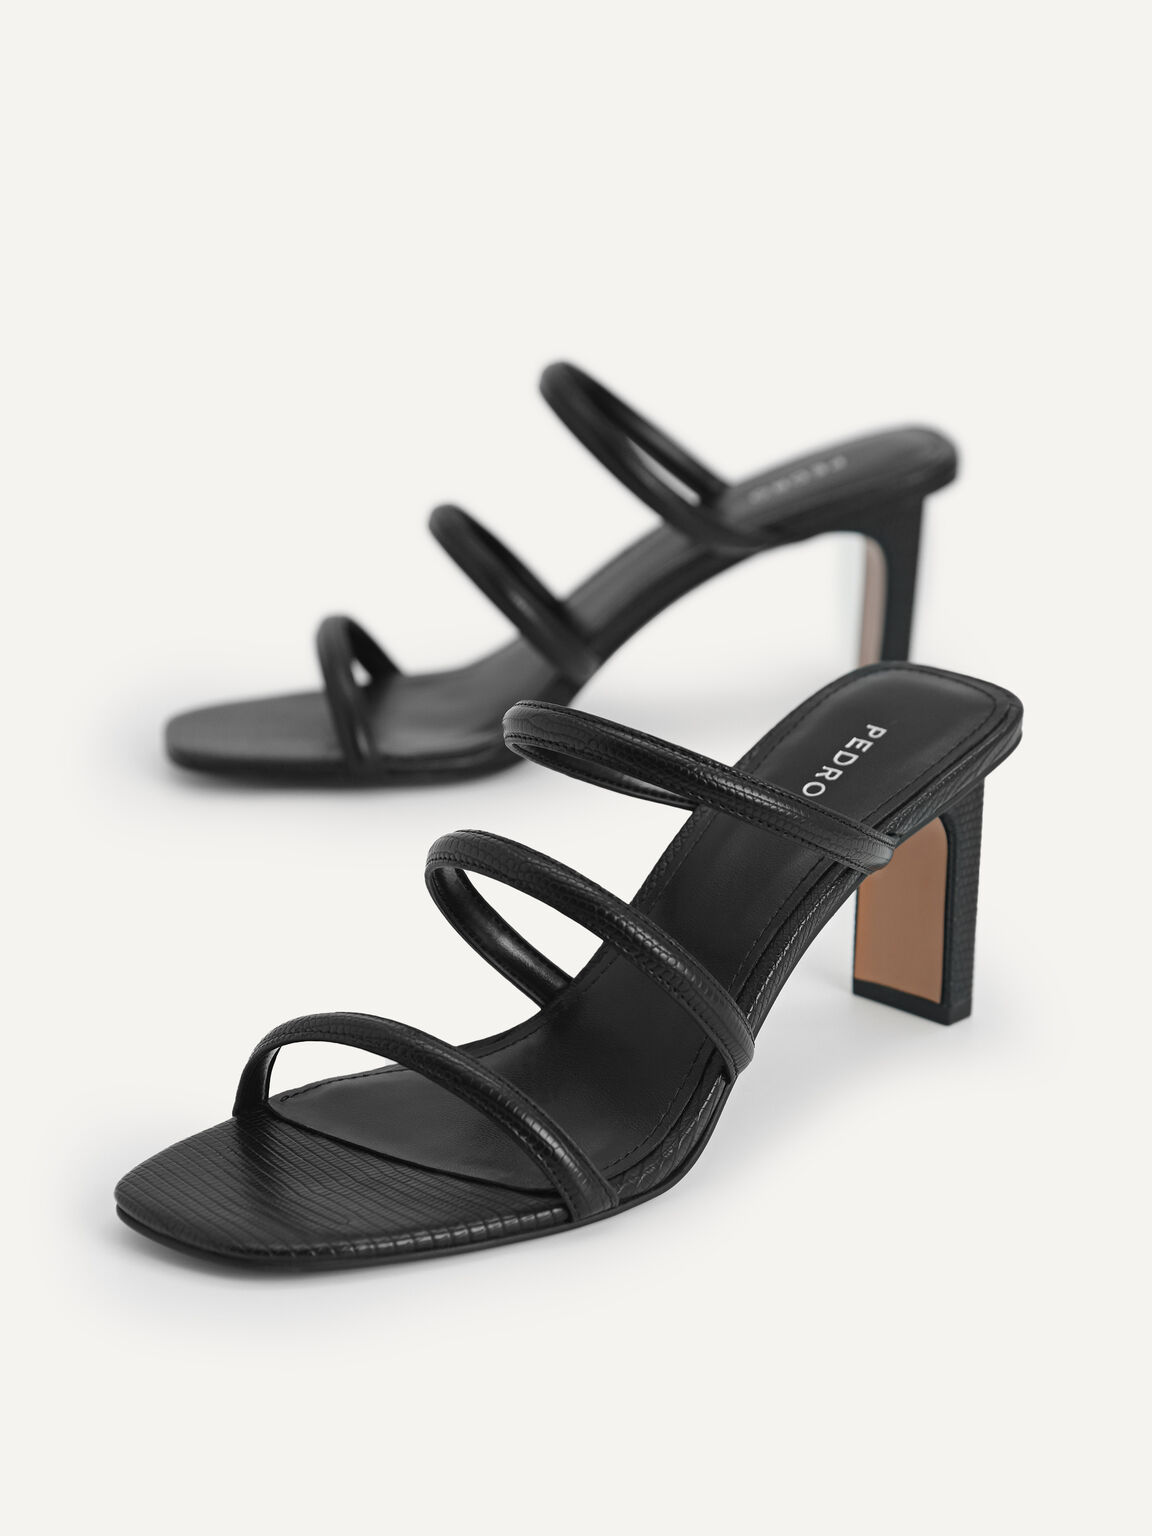 Strappy Heeled Lizard-Effect Sandals, Black, hi-res